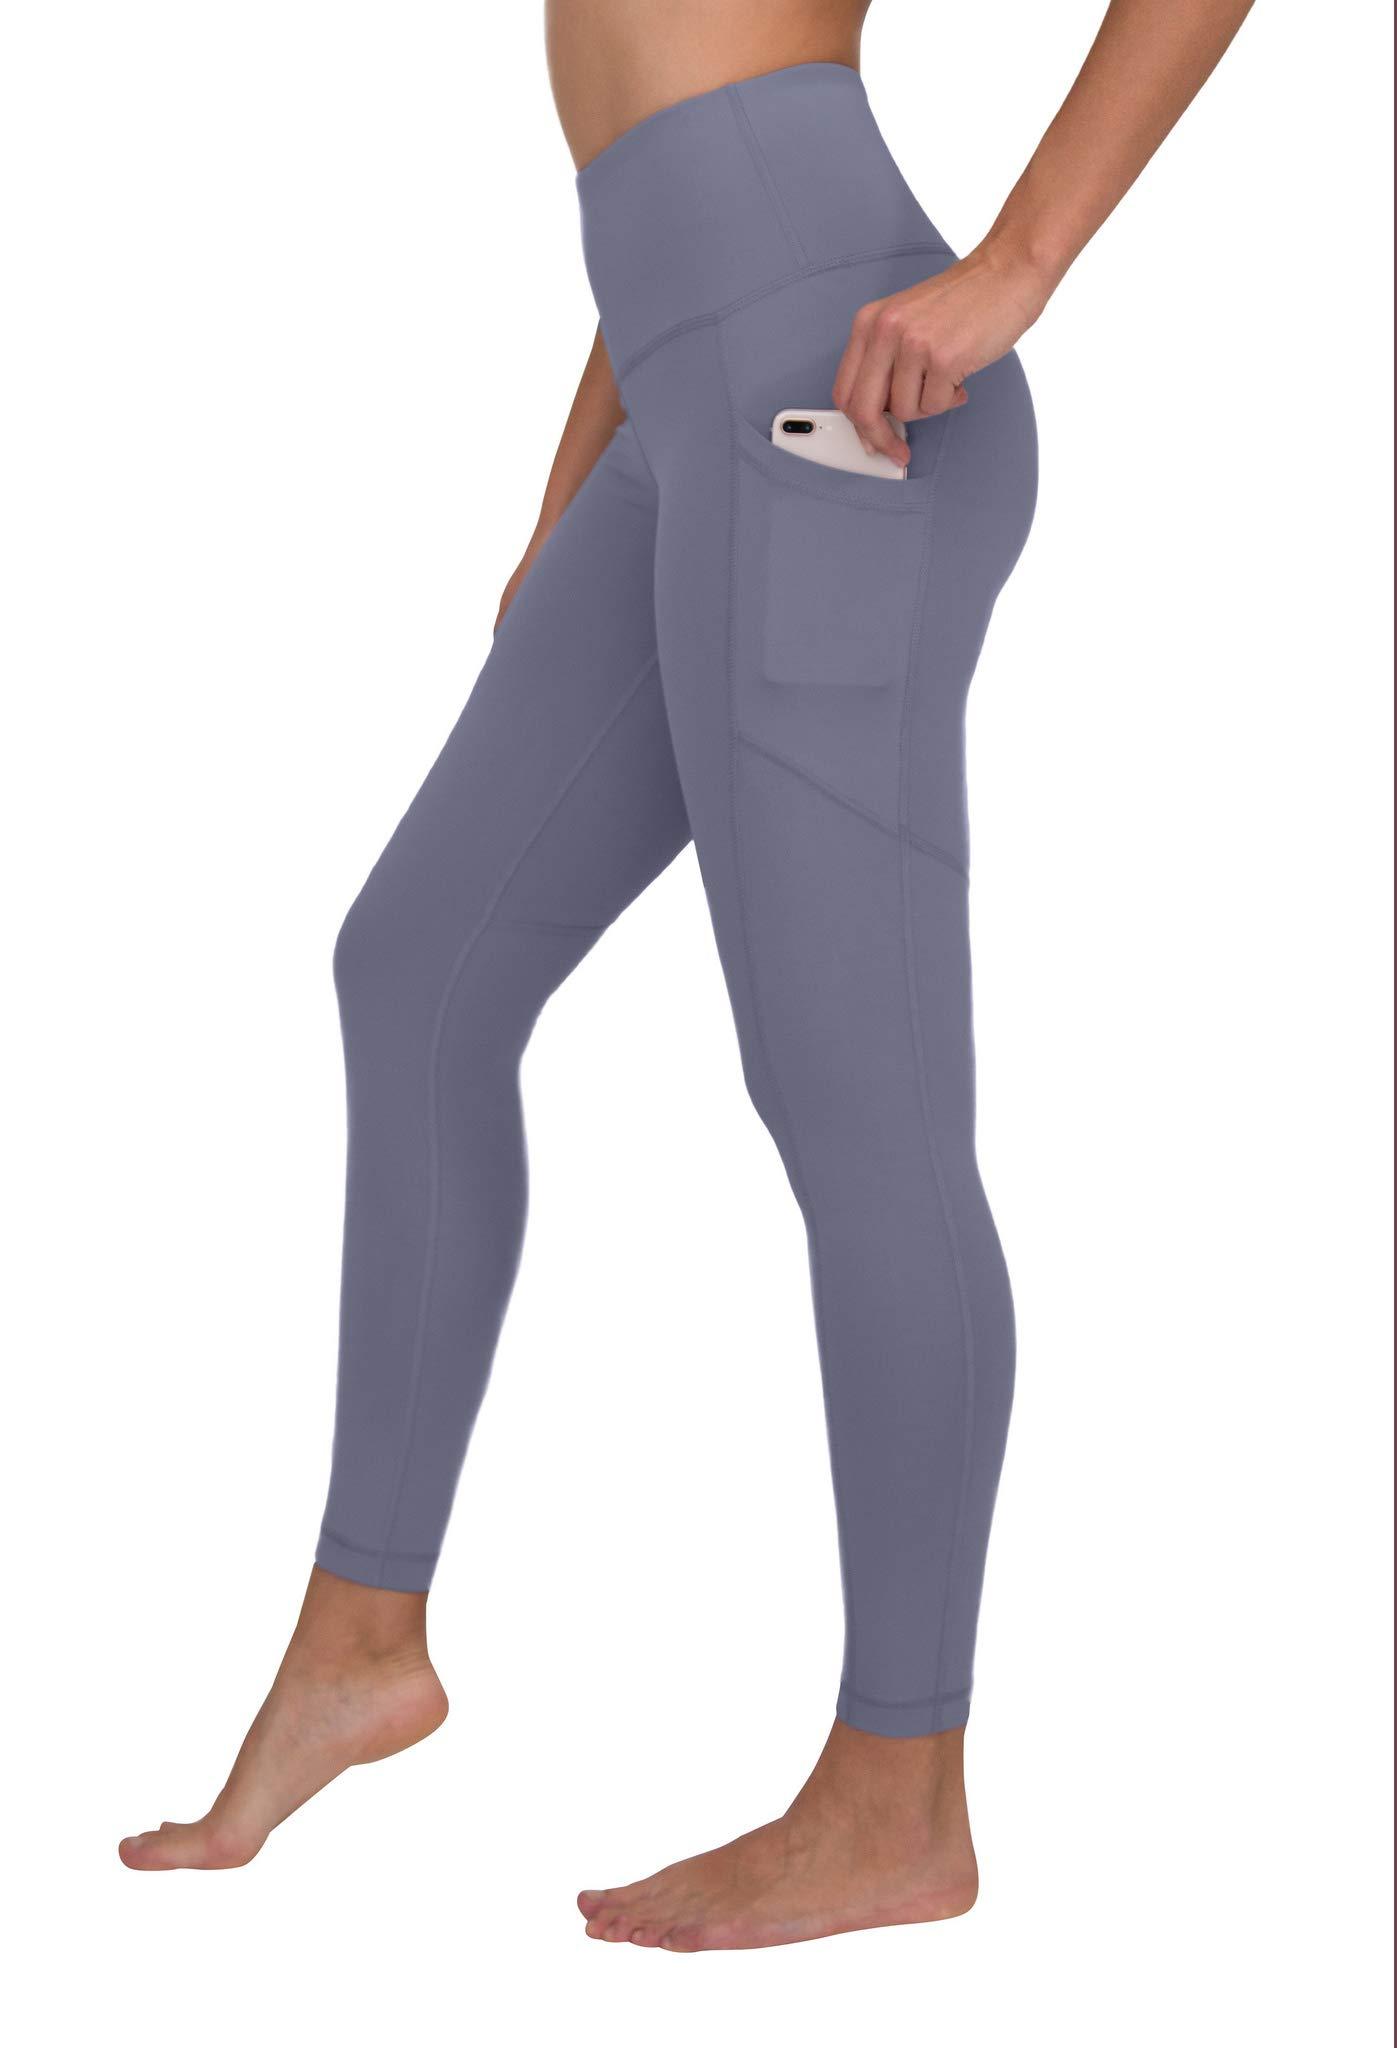 35de5af689a789 Galleon - 90 Degree By Reflex High Waist Interlink Yoga Pants - Blueberry  Ice - XS